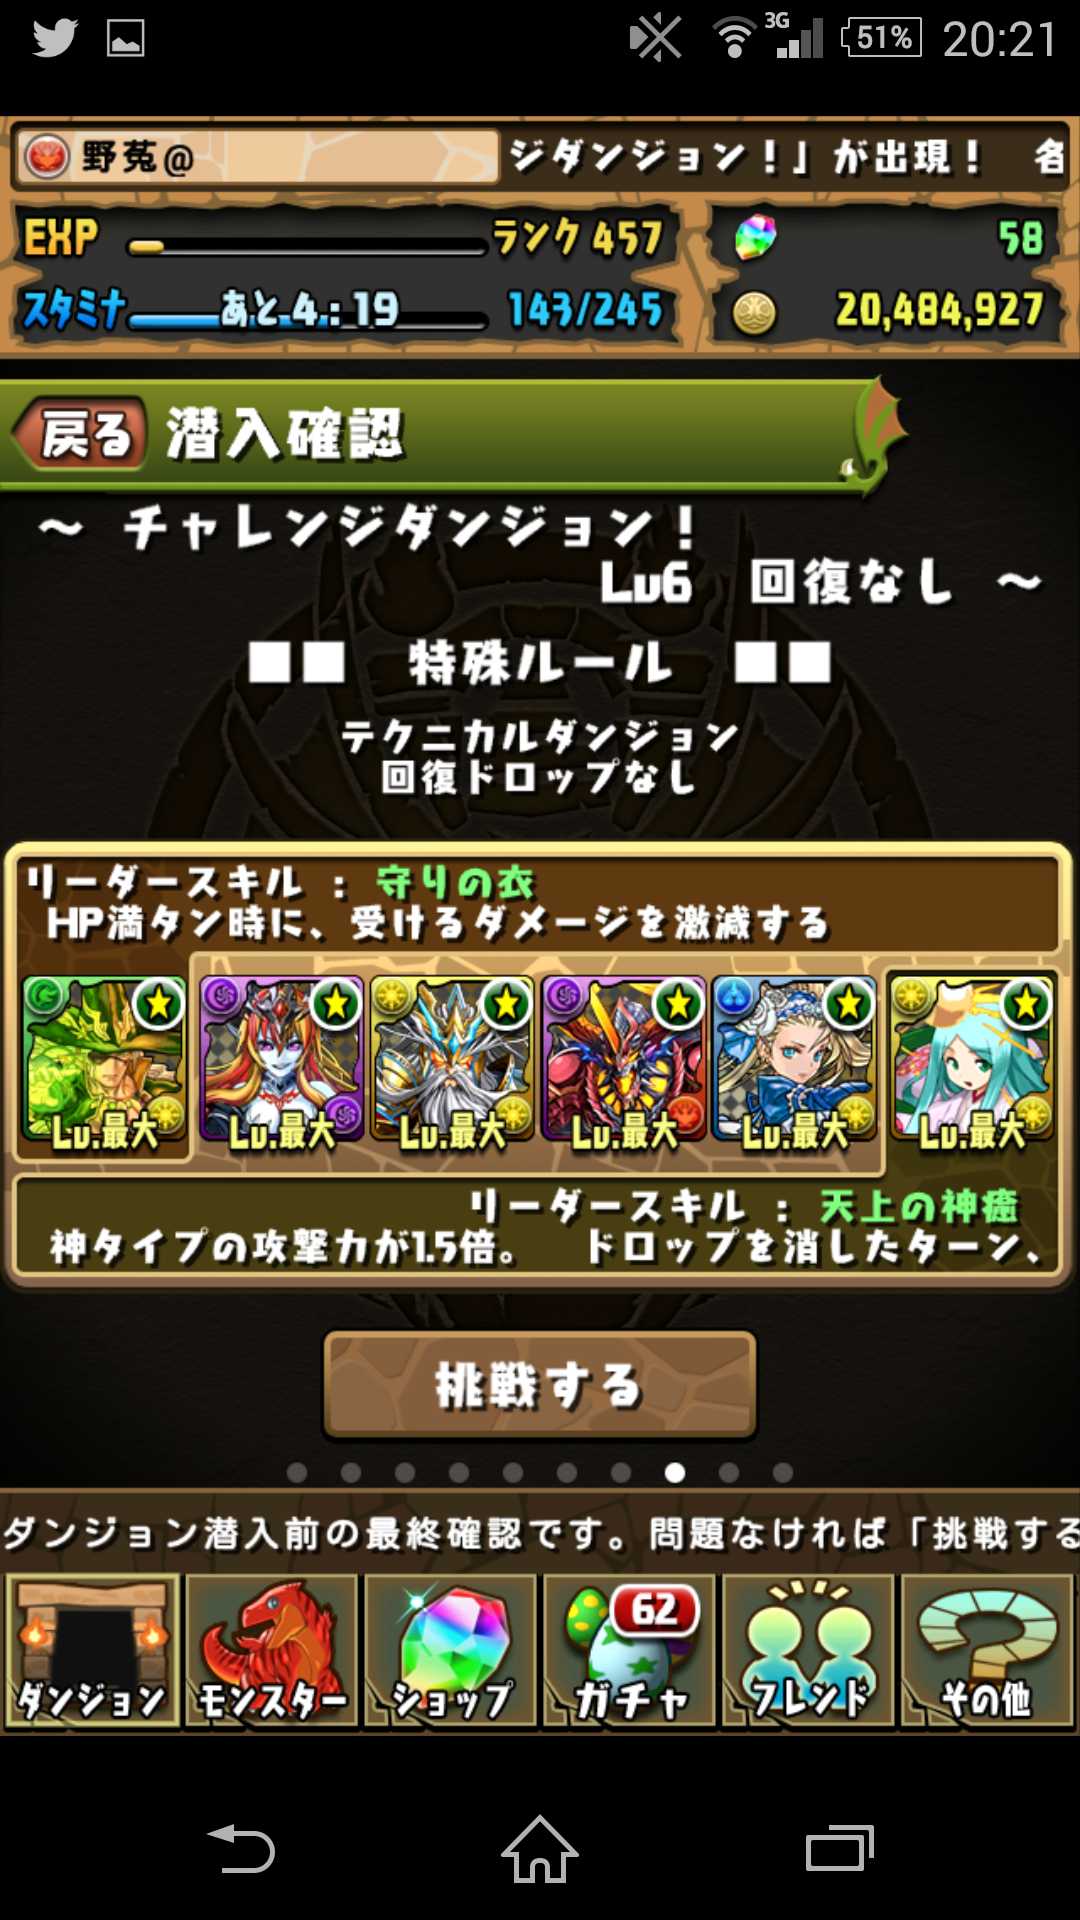 Screenshot_2015-01-29-20-21-33.png